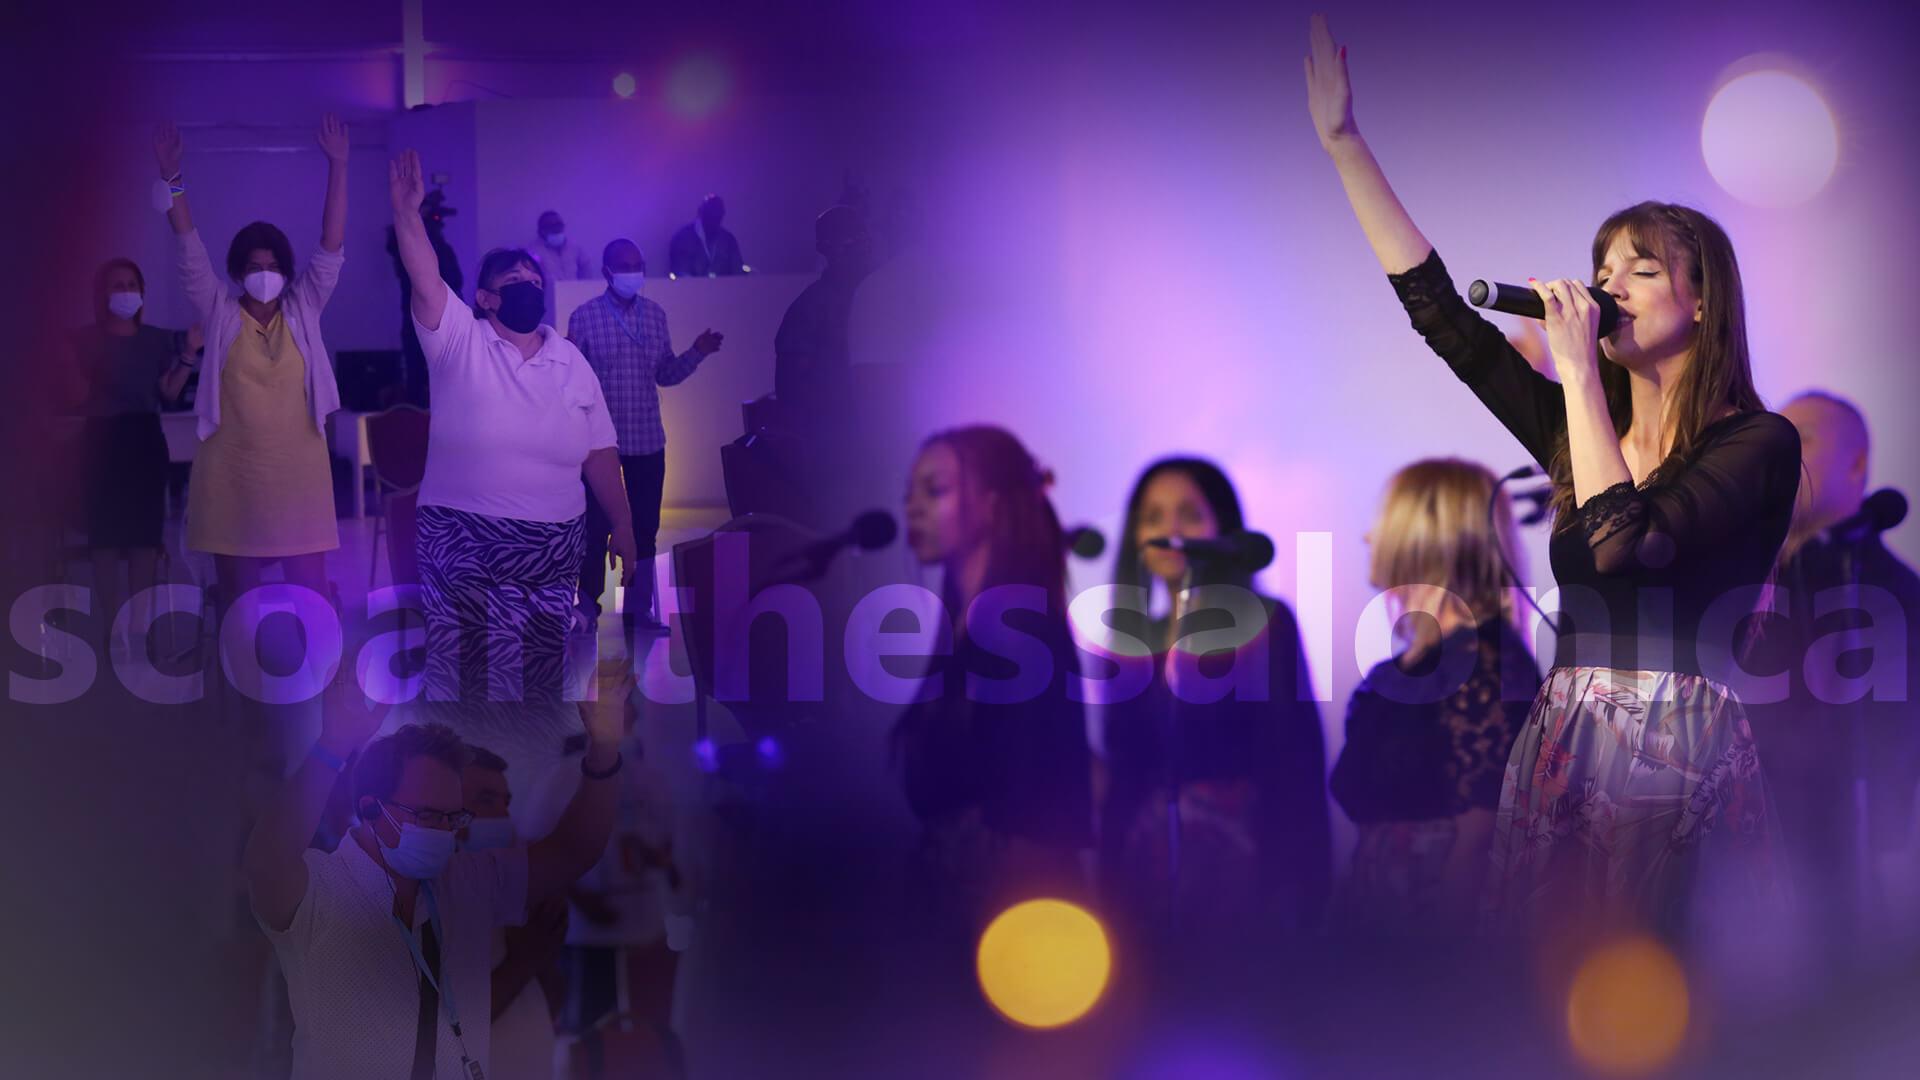 SCOAN_THESSALONICA_WORSHIP_2021_08_29